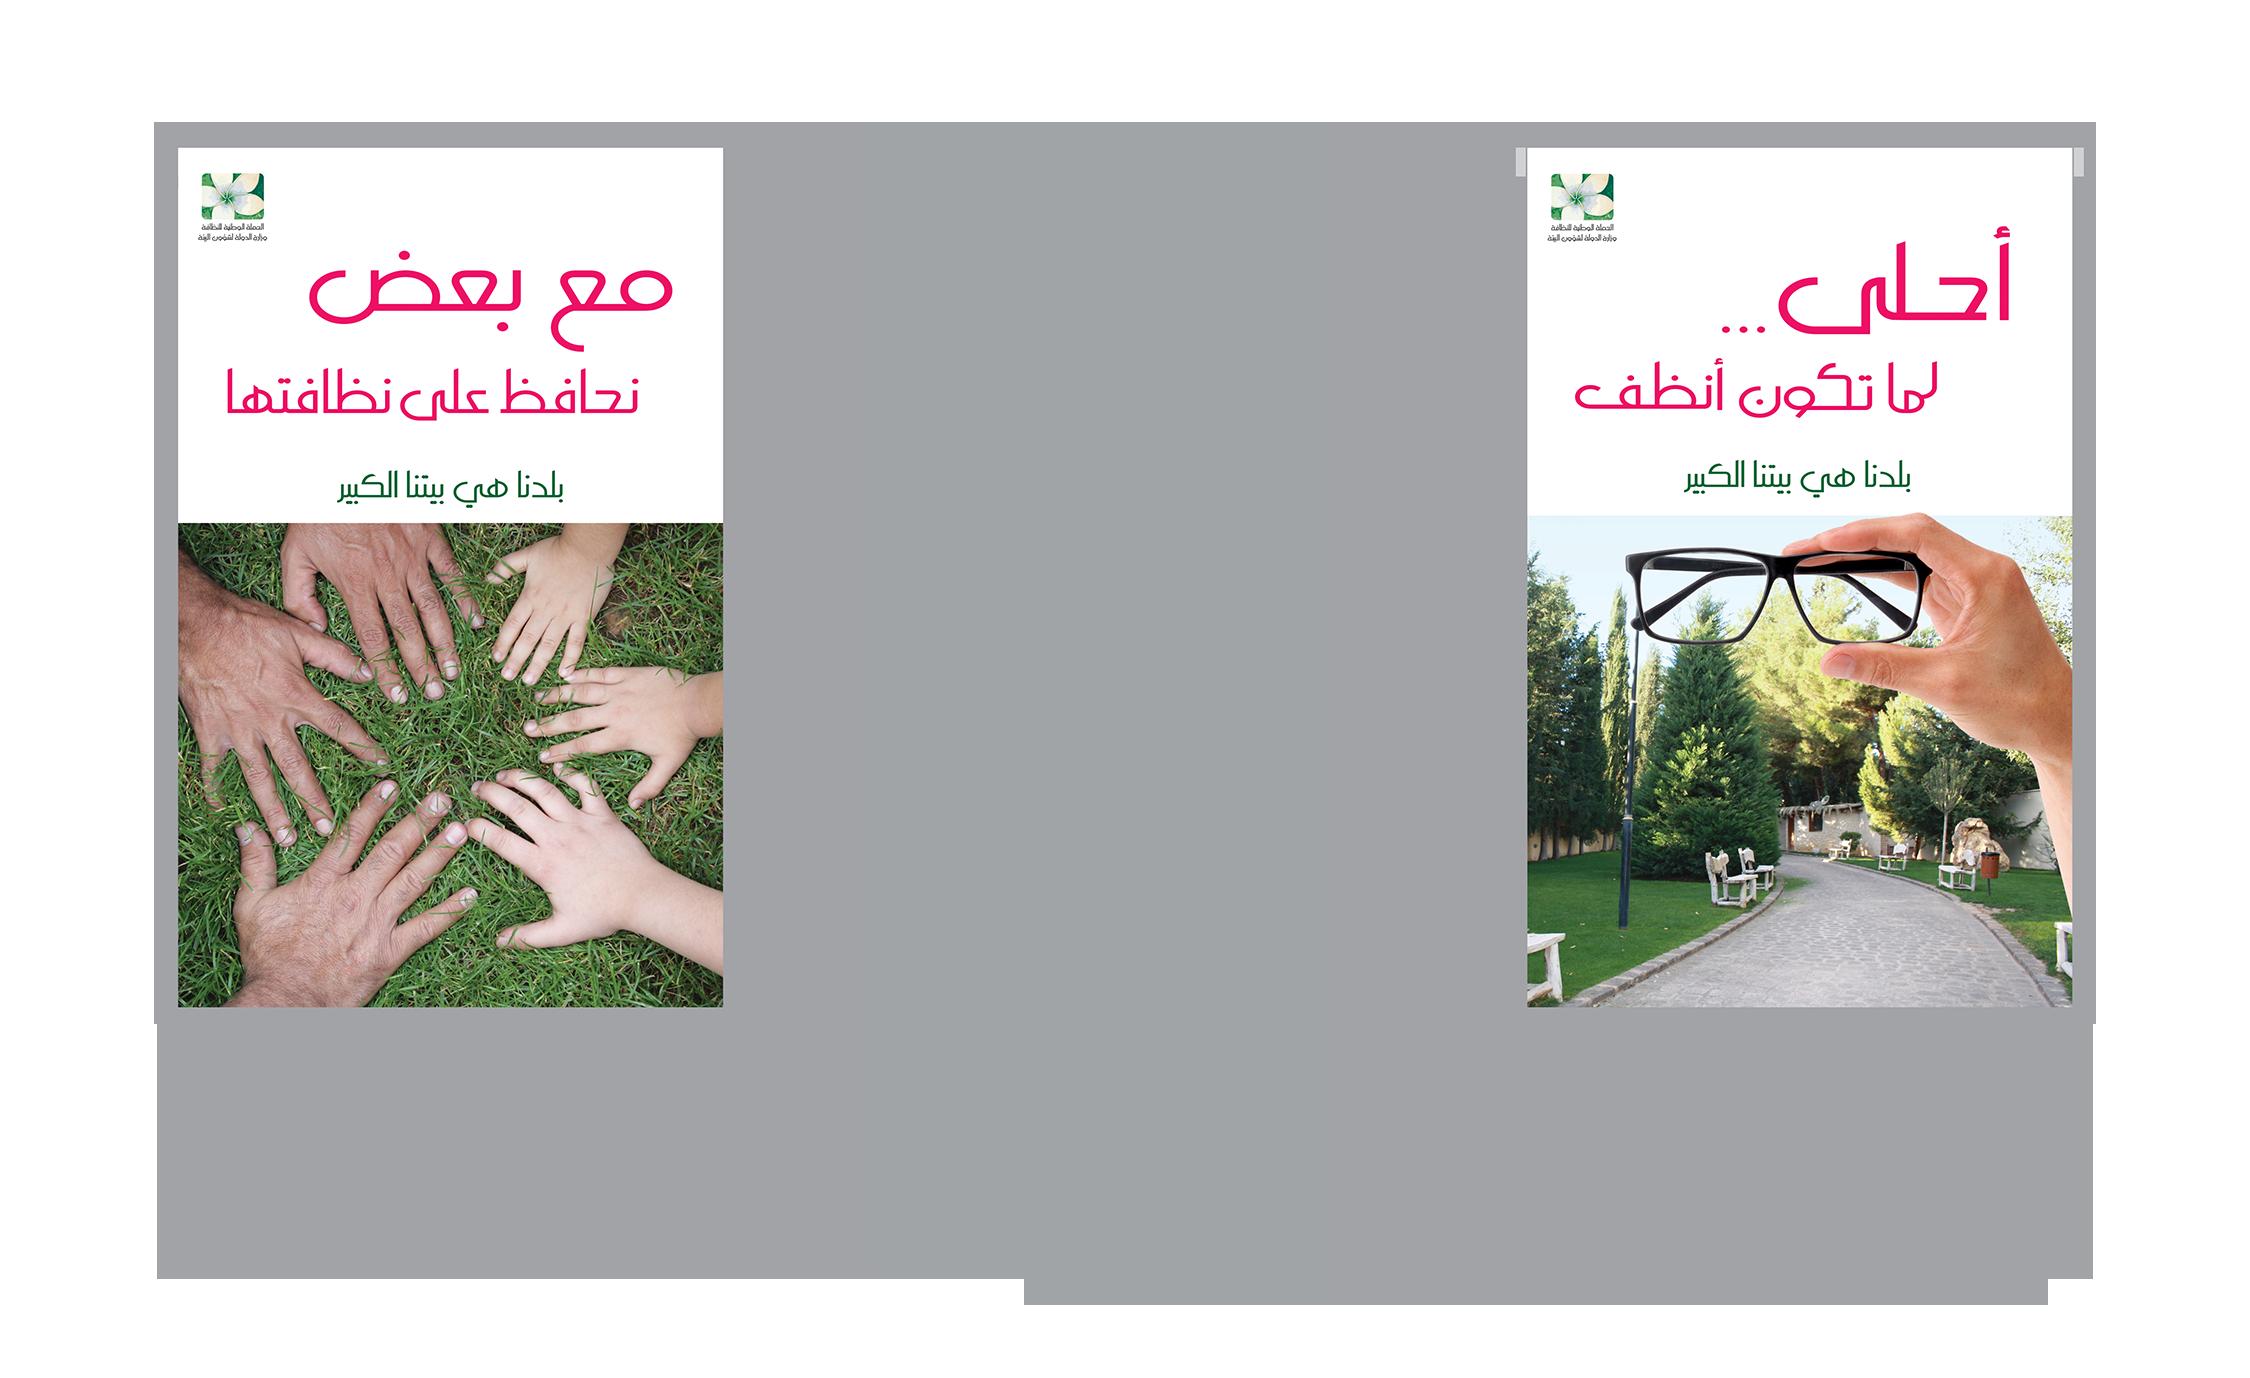 Nour Alnader, Portfolio, Umwelt, Ministerium, Environment, Syria, Fotografie,Kampagnen, Design, Art Direction, Billboard, Straßen Plakat,sauber, Cleaning